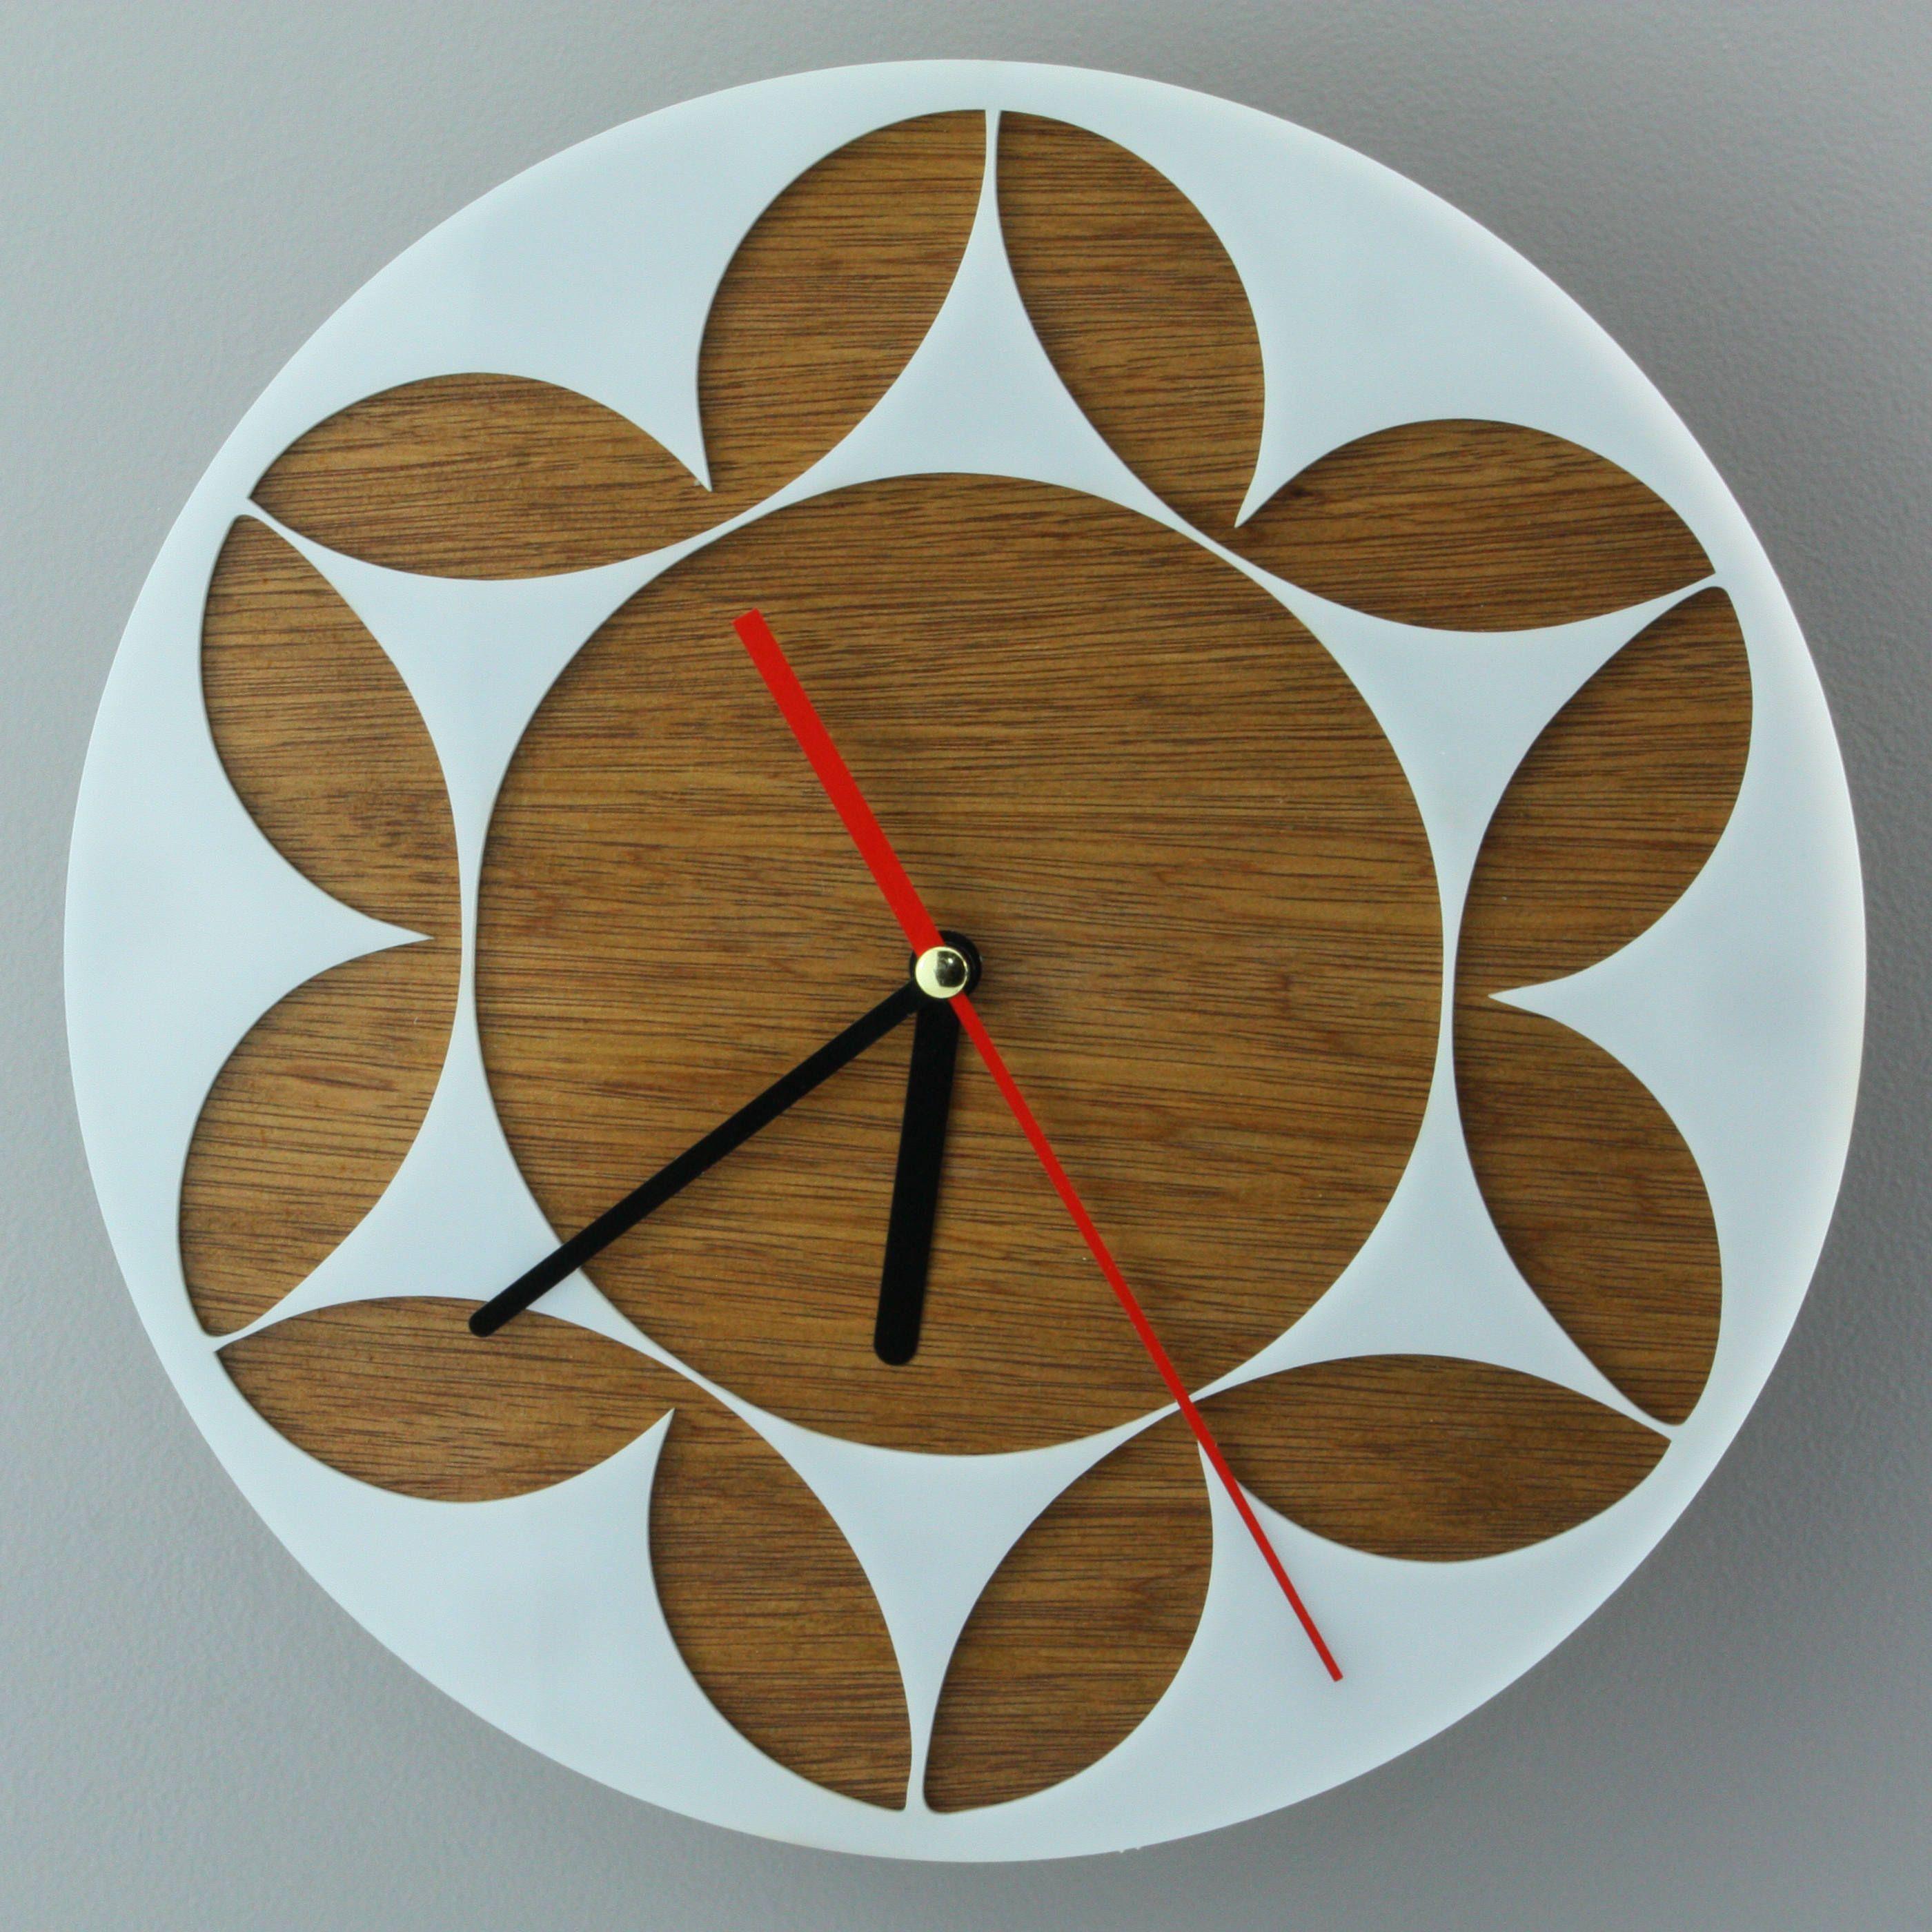 Wall clockwooden wall clocksteampunk wall clockbig ovalround